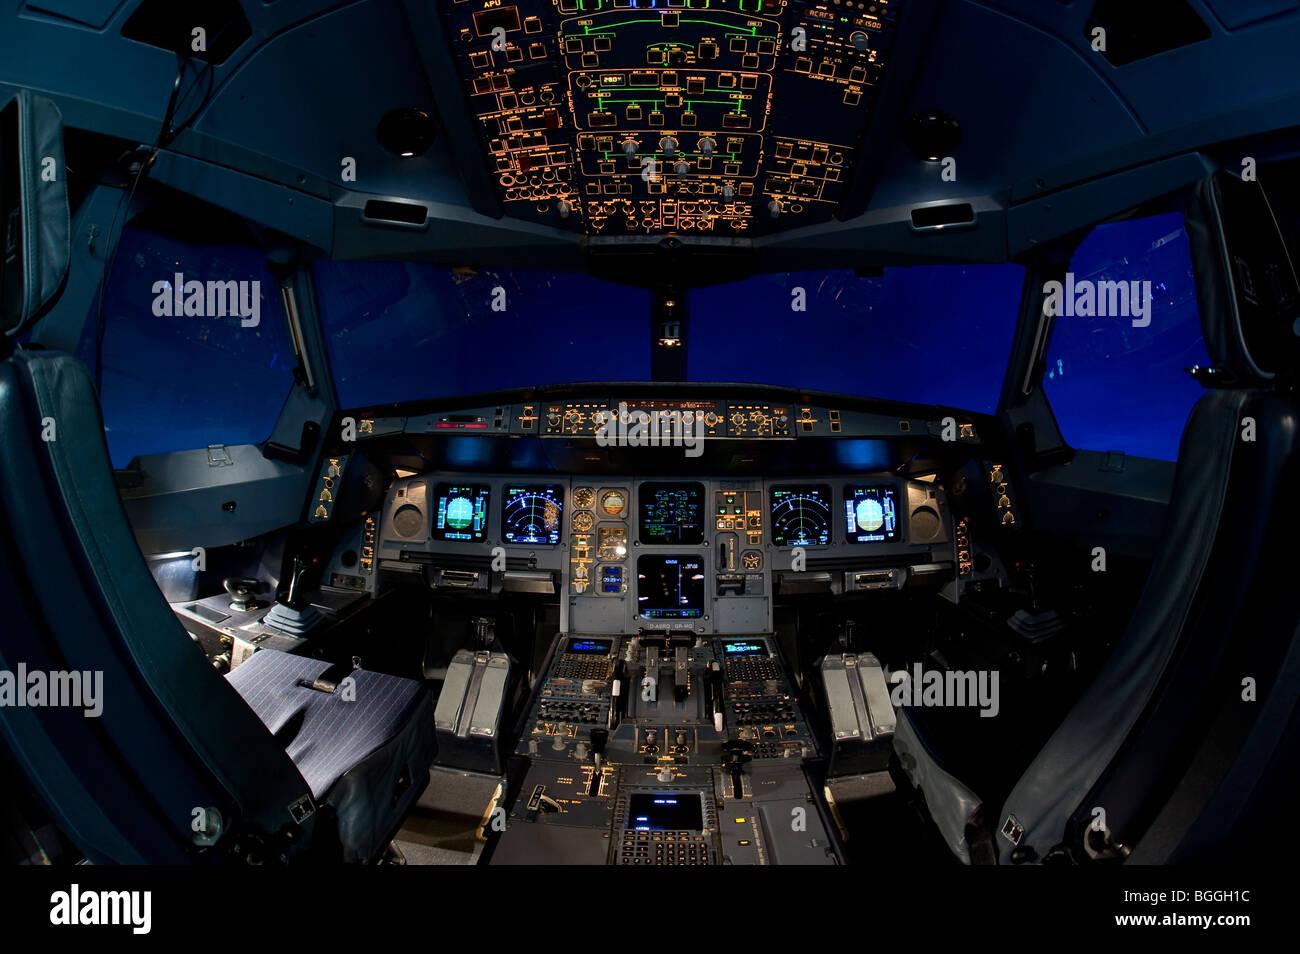 Flight Simulation Center Berlin, ZFB, cockpit of an Airbus A330/340 flight simulator, Berlin, Germany, Europe - Stock Image